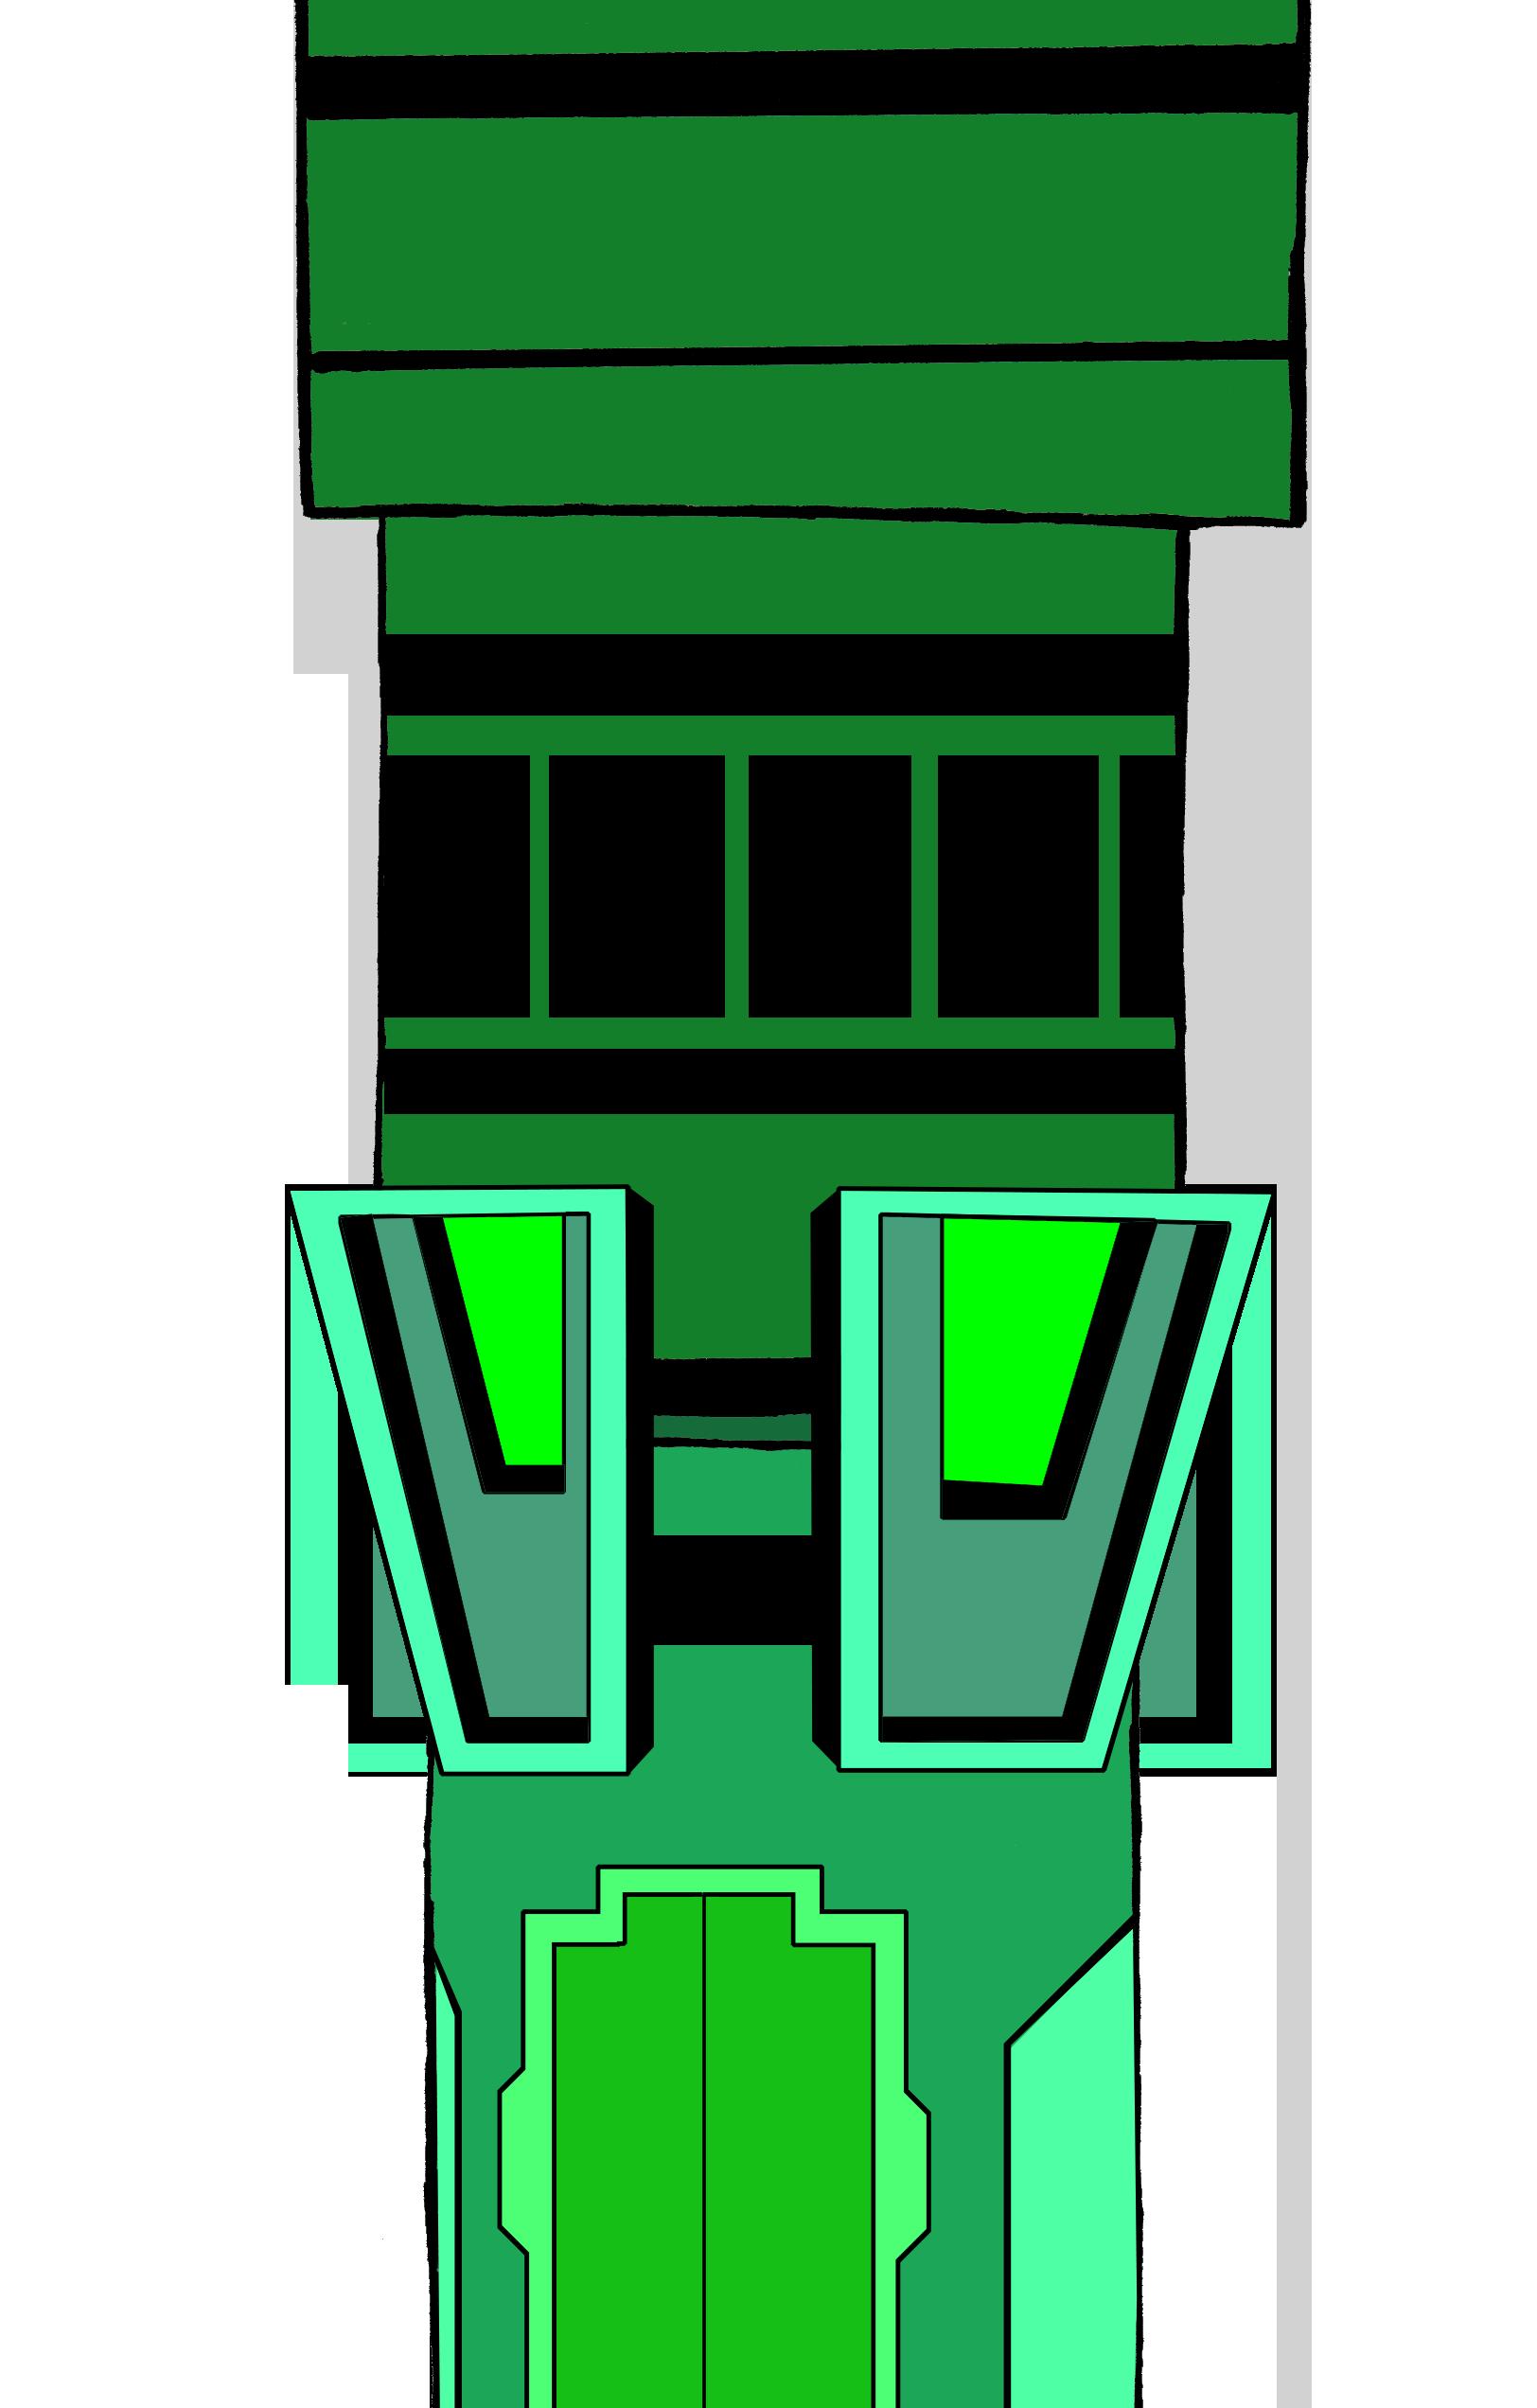 Plumber Tower